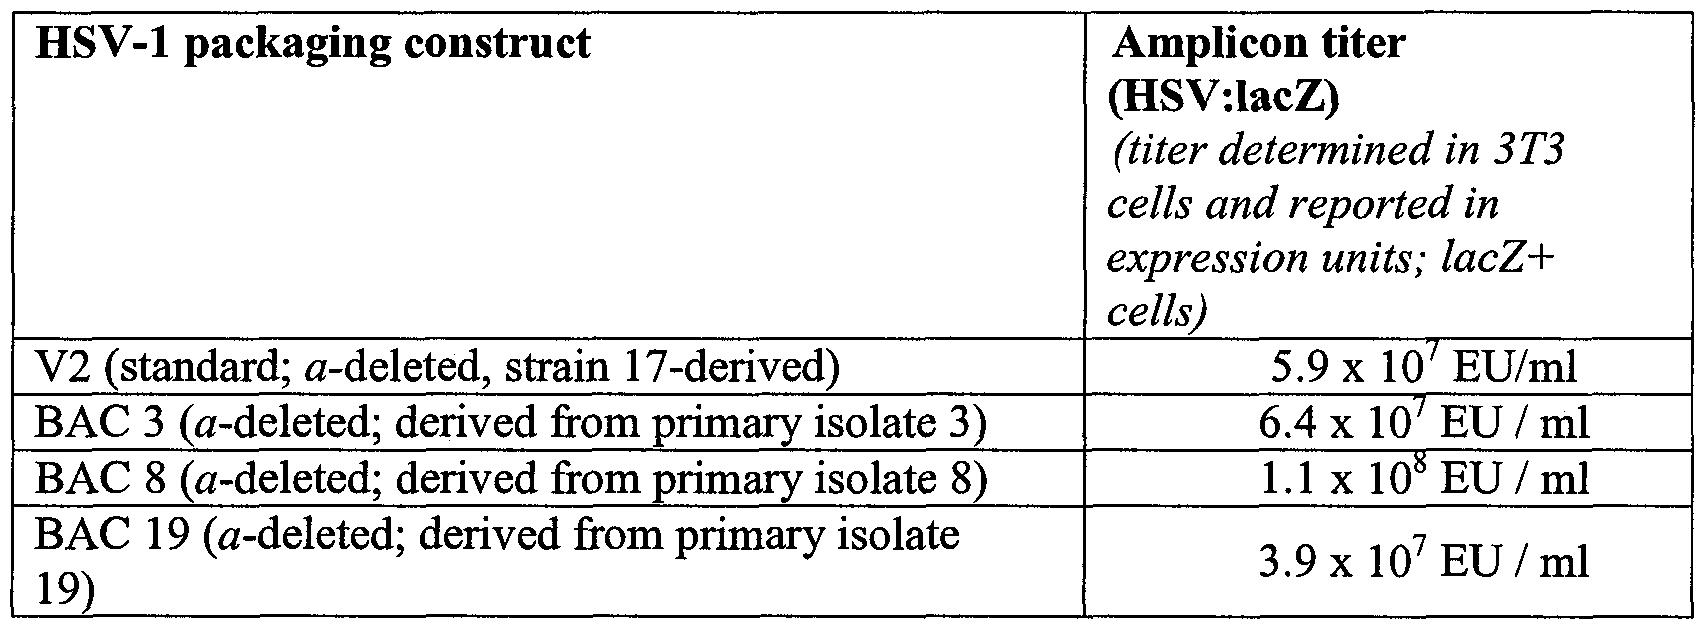 WO2008151182A2 - Herpes simplex virus amplicon vectors